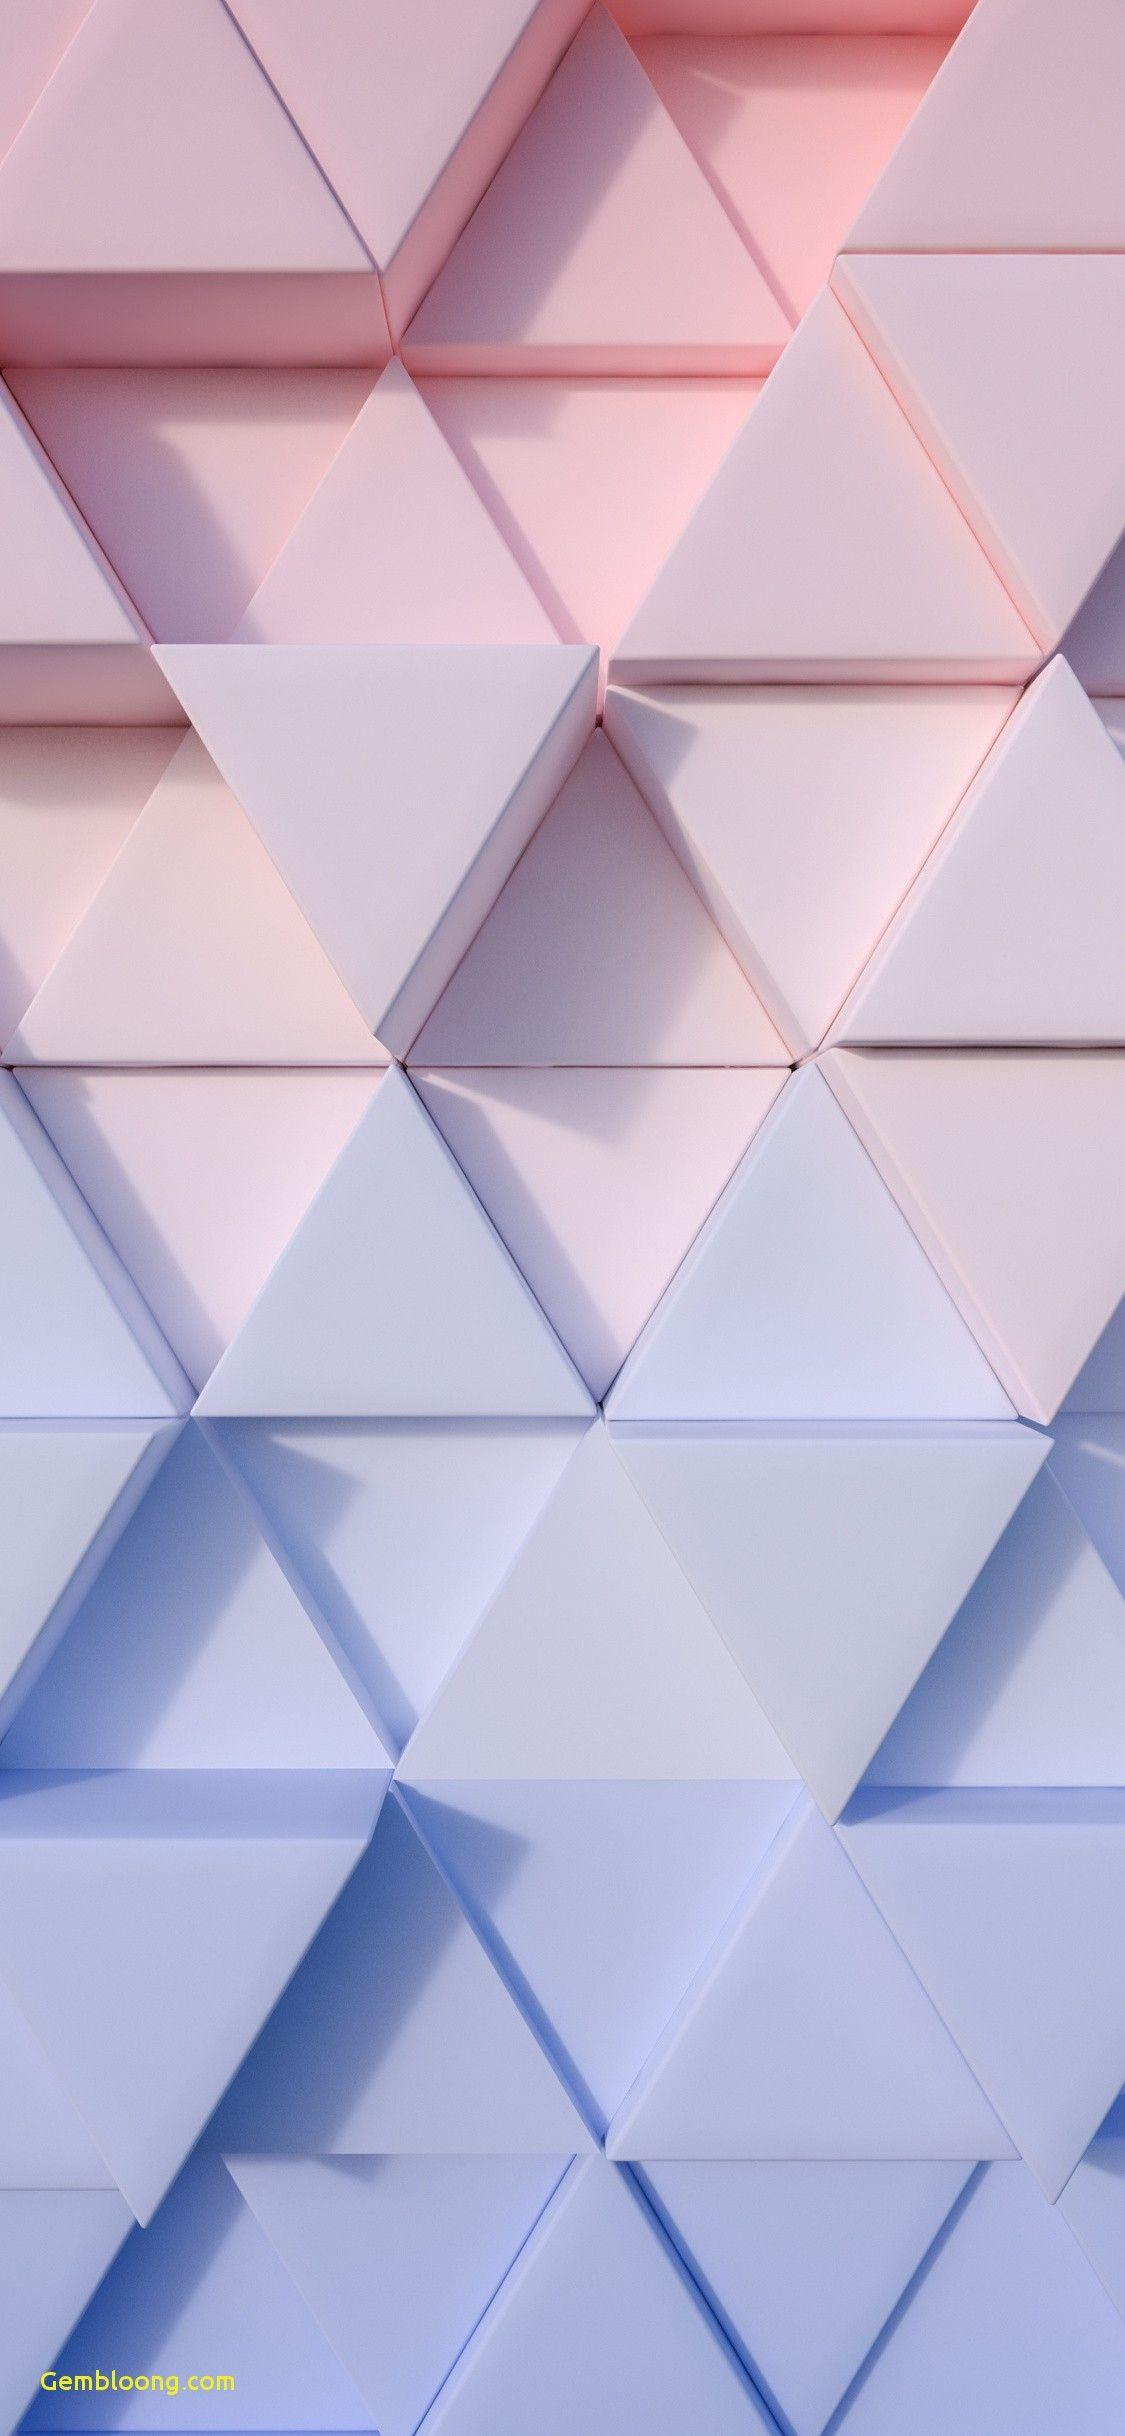 iPhone X 4K Wallpapers - Wallpaper Cave